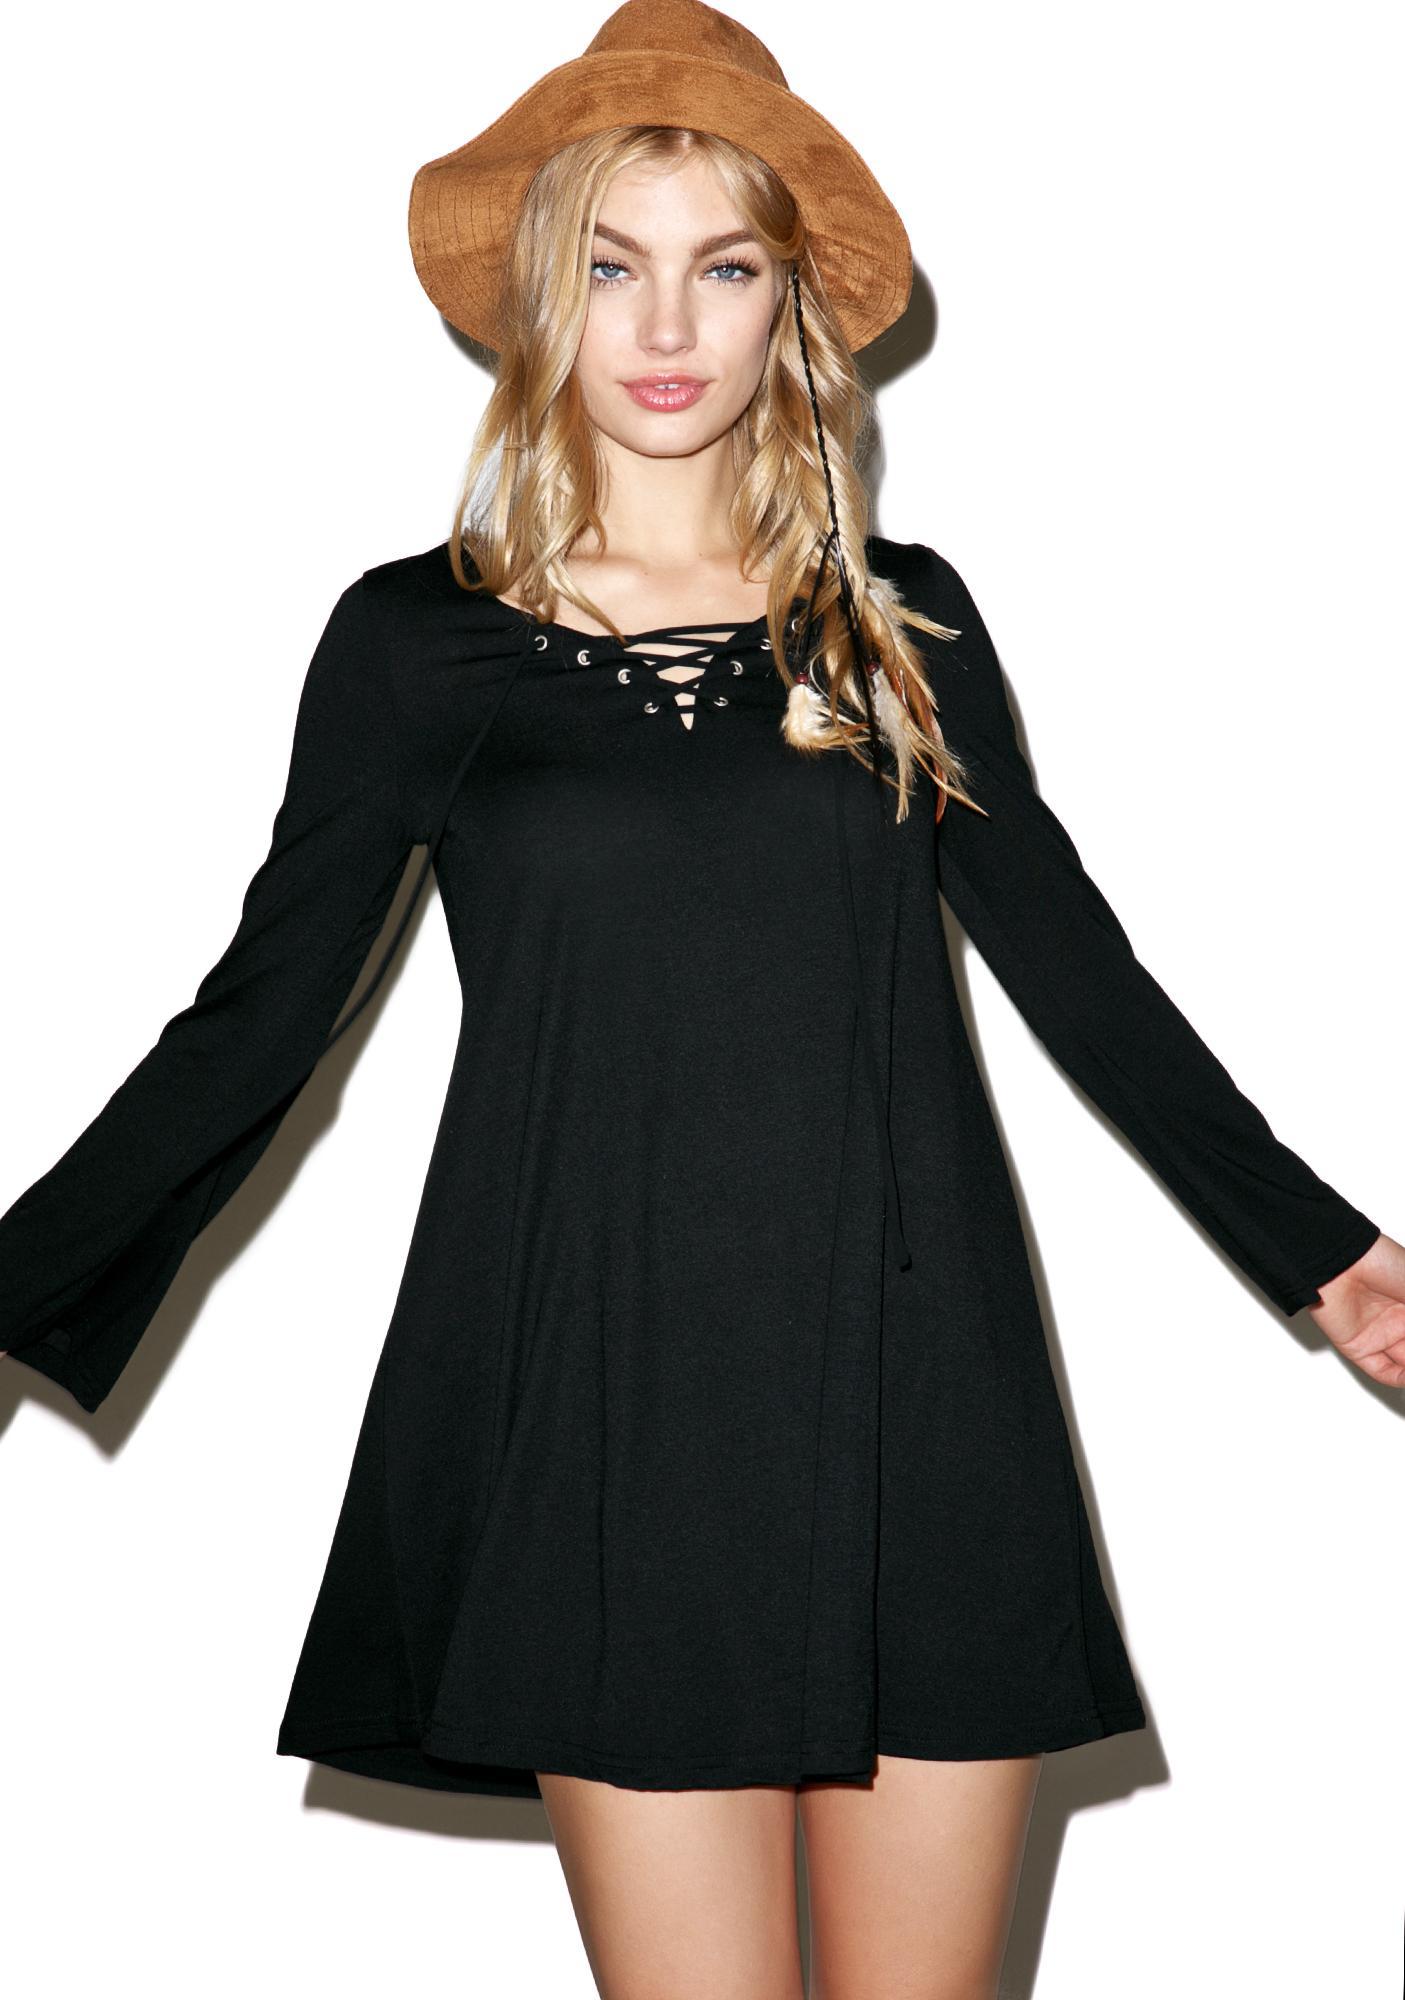 Glamorous Up & At Them Lace Up Tunic Dress